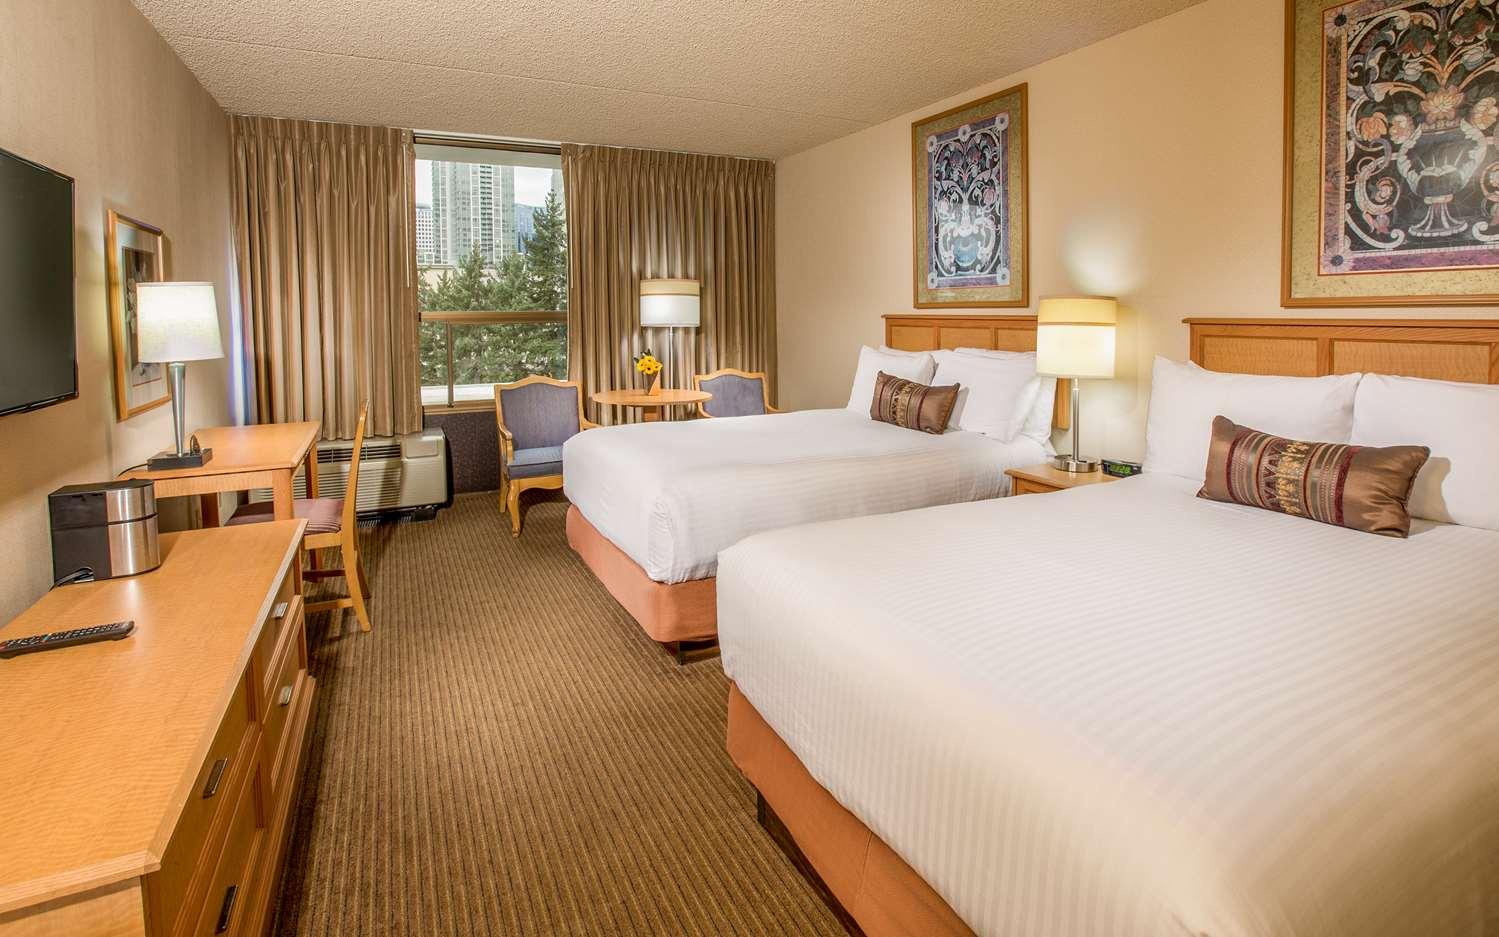 Hotel Conference Rooms Bellevue Ne